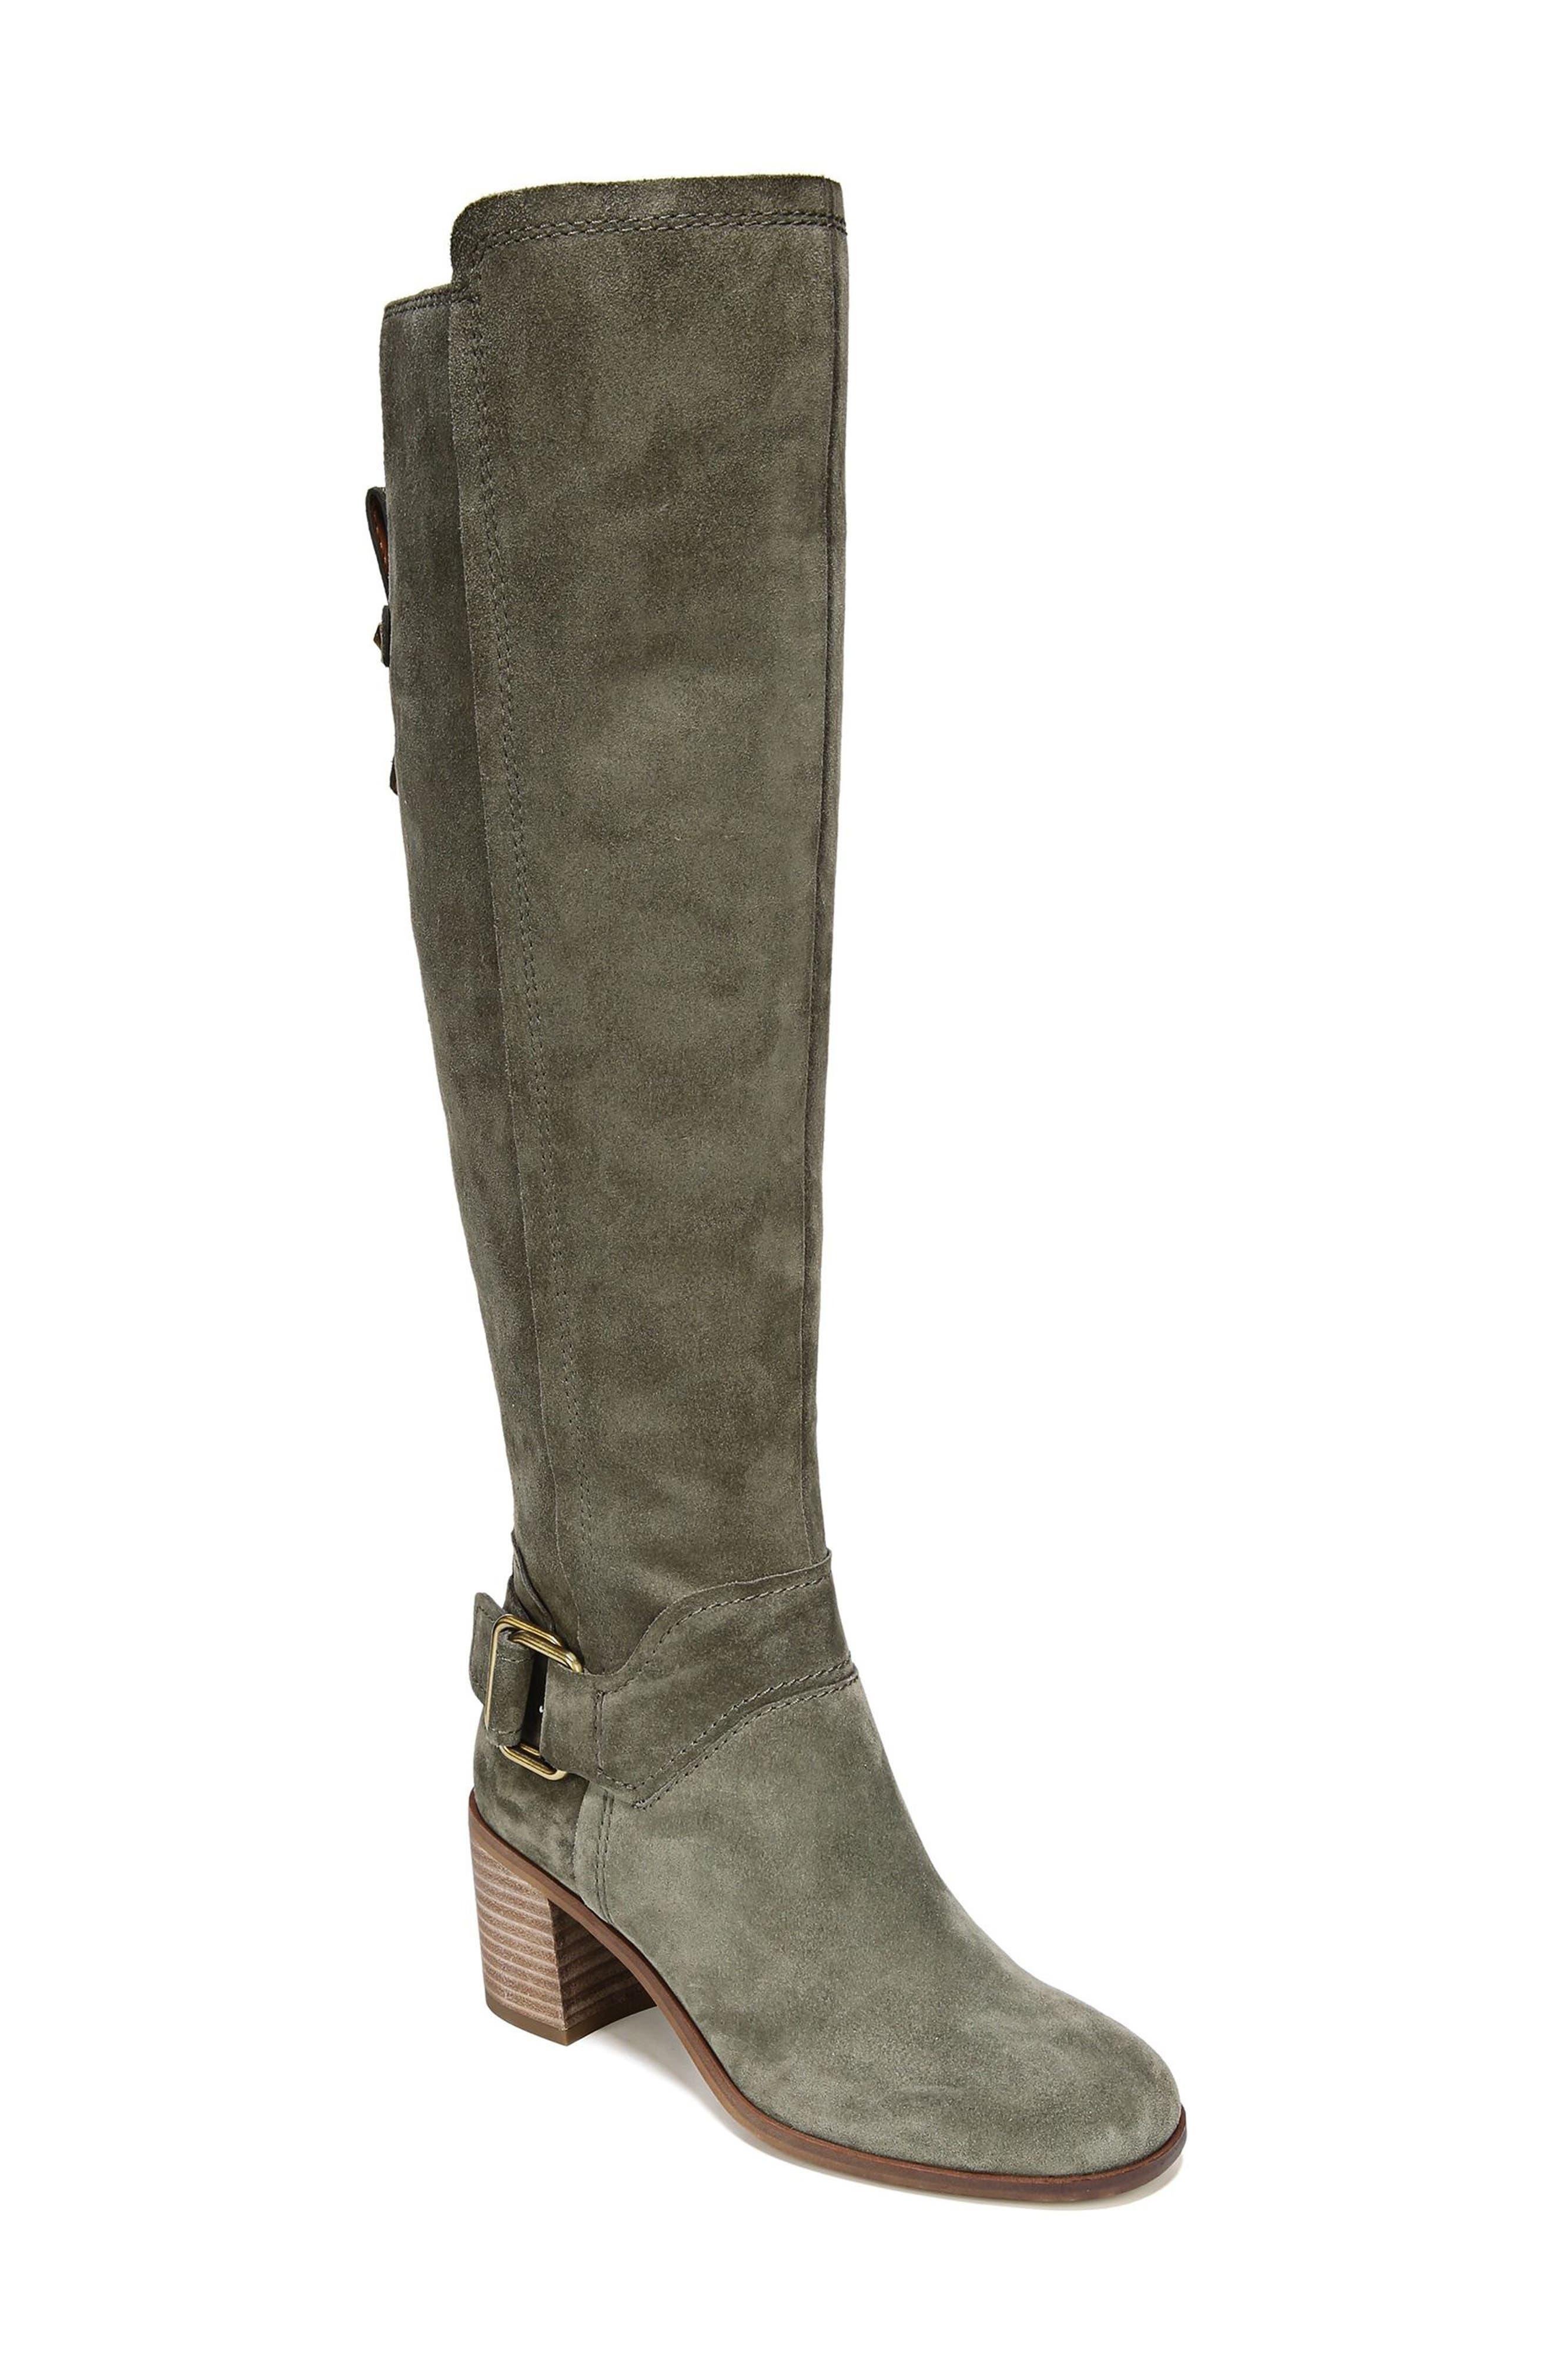 Main Image - SARTO by Franco Sarto Mystic Knee High Boot (Women)